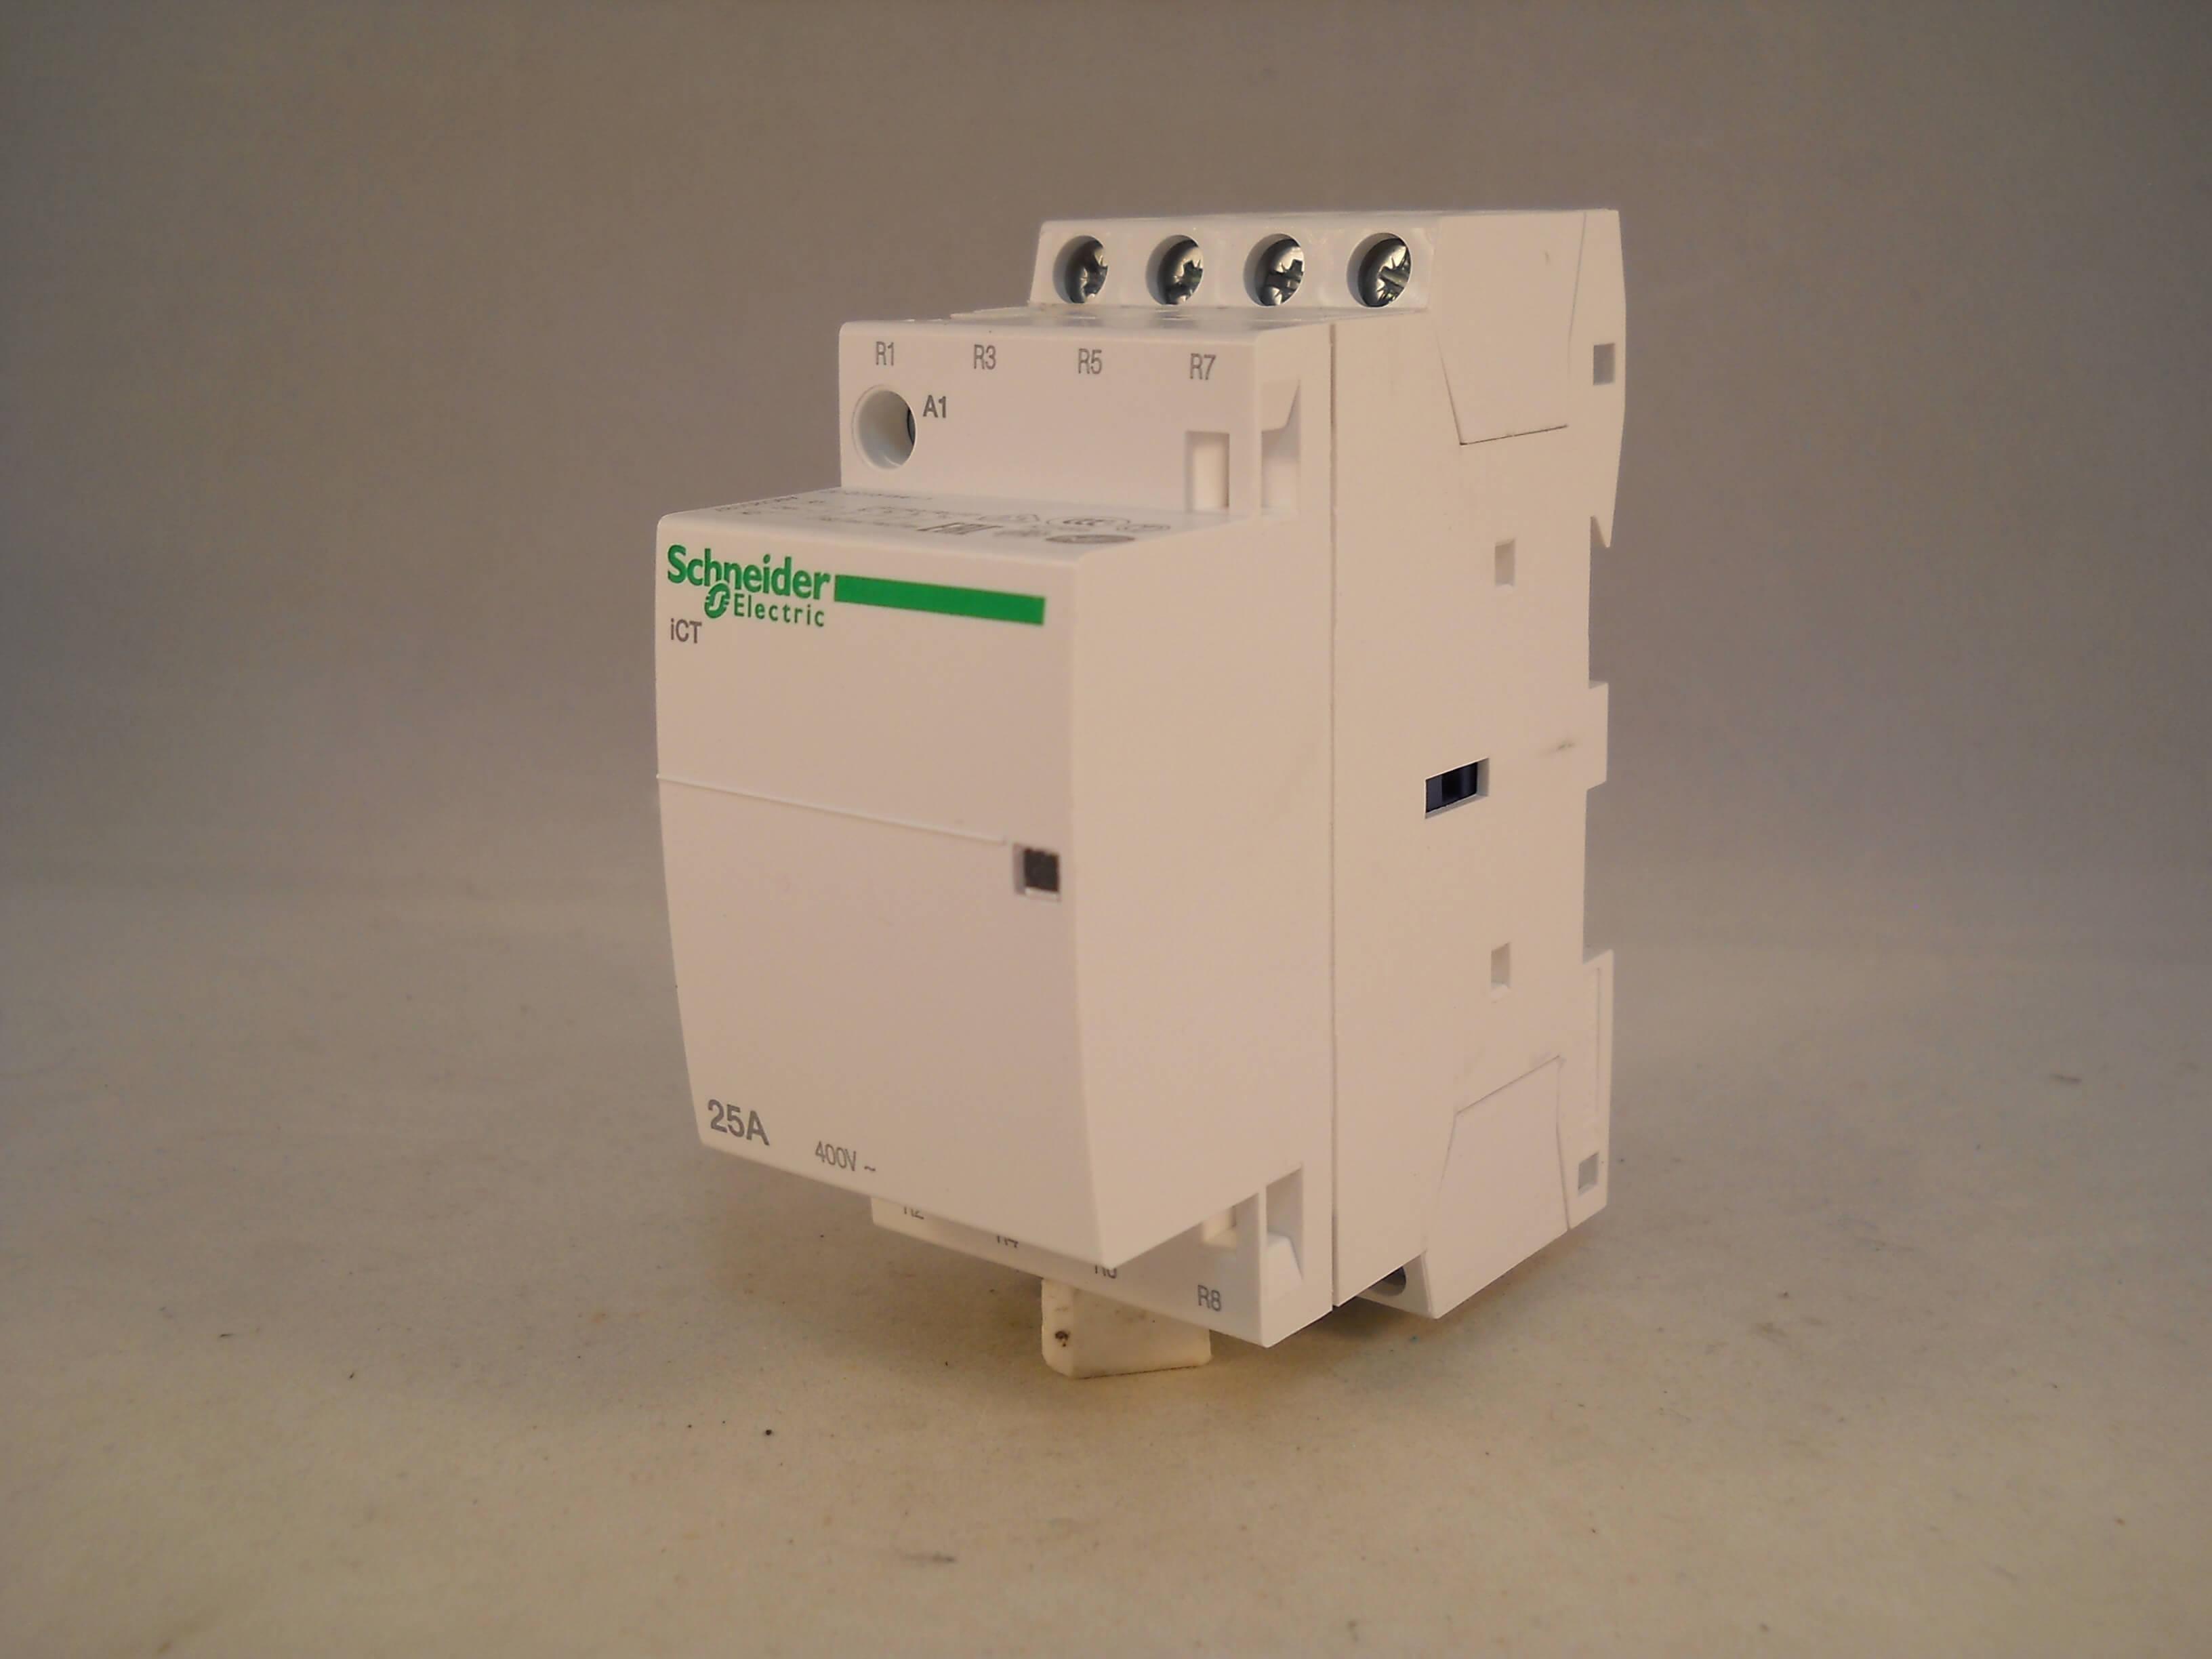 schneider ict 25a contactor wiring diagram rj45 phone jack 25 amp 4 pole 24vac coil n c acti 9